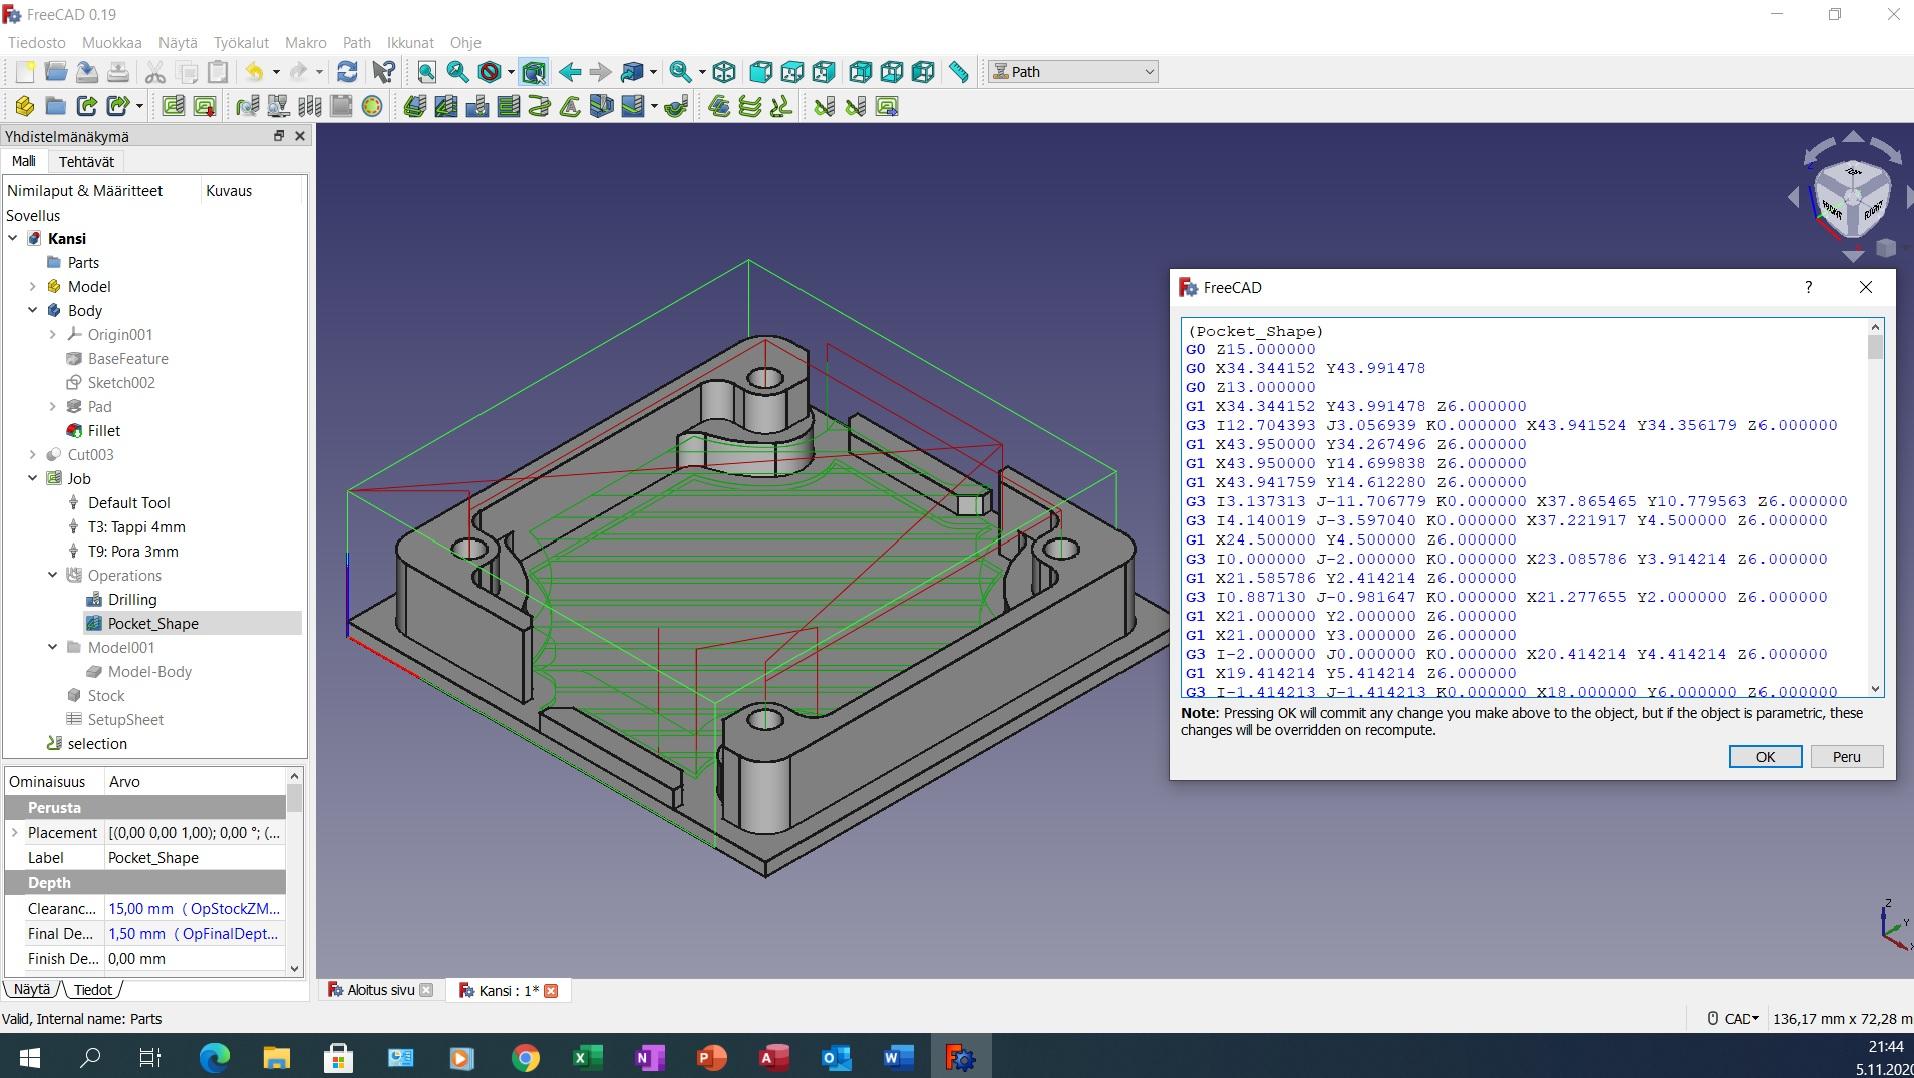 FreeCAD 3D- mallinnus